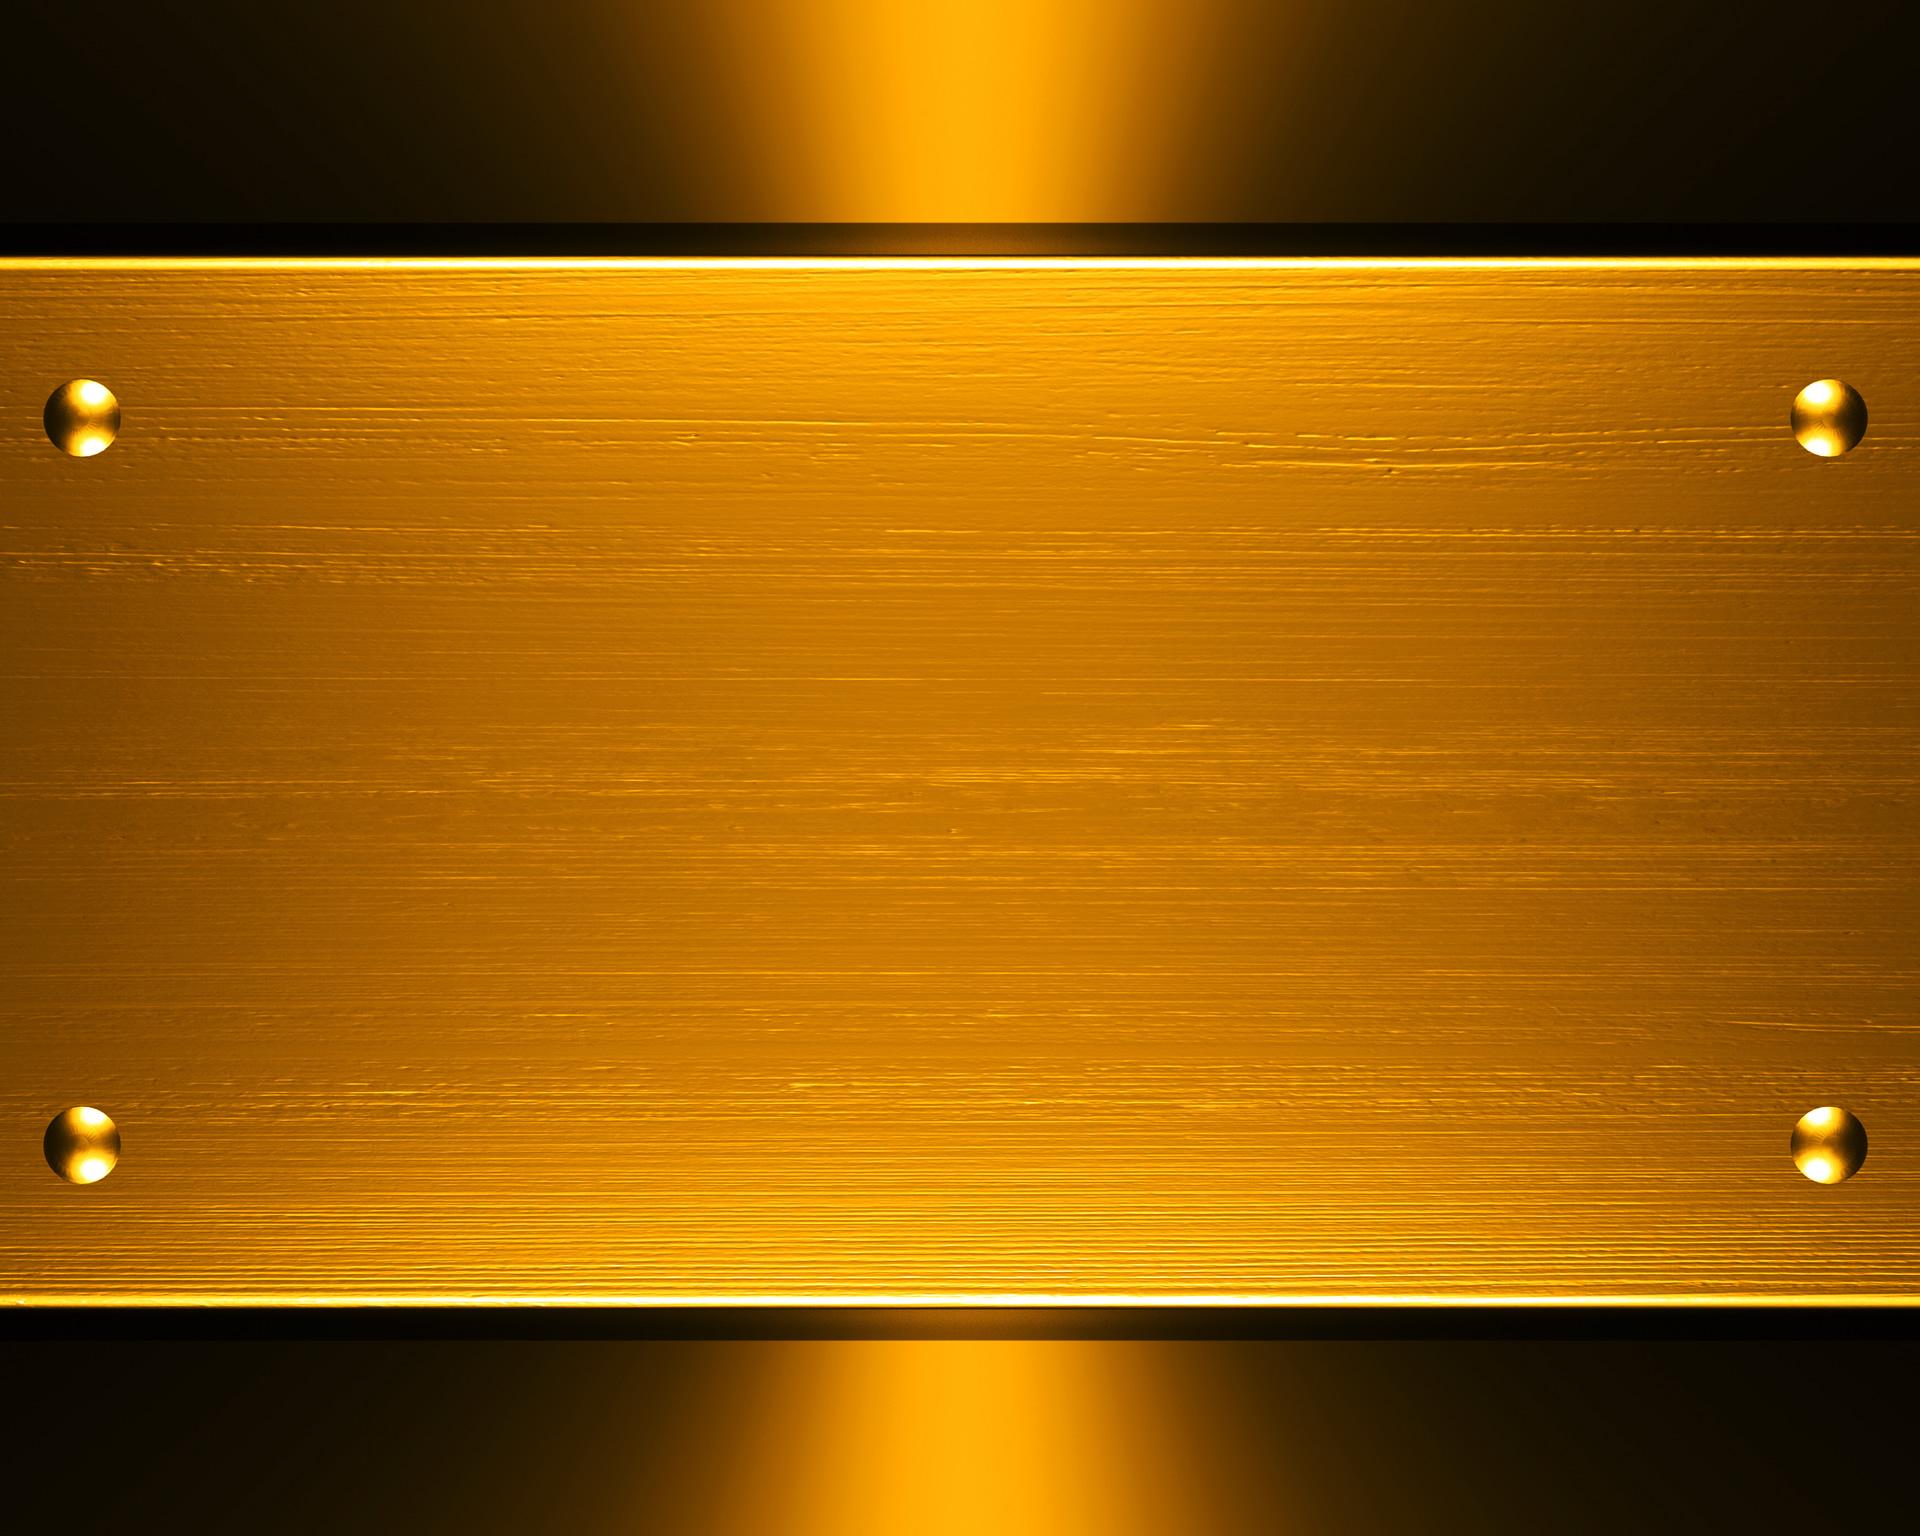 Metallic Gold Wallpaper Wallpapersafari